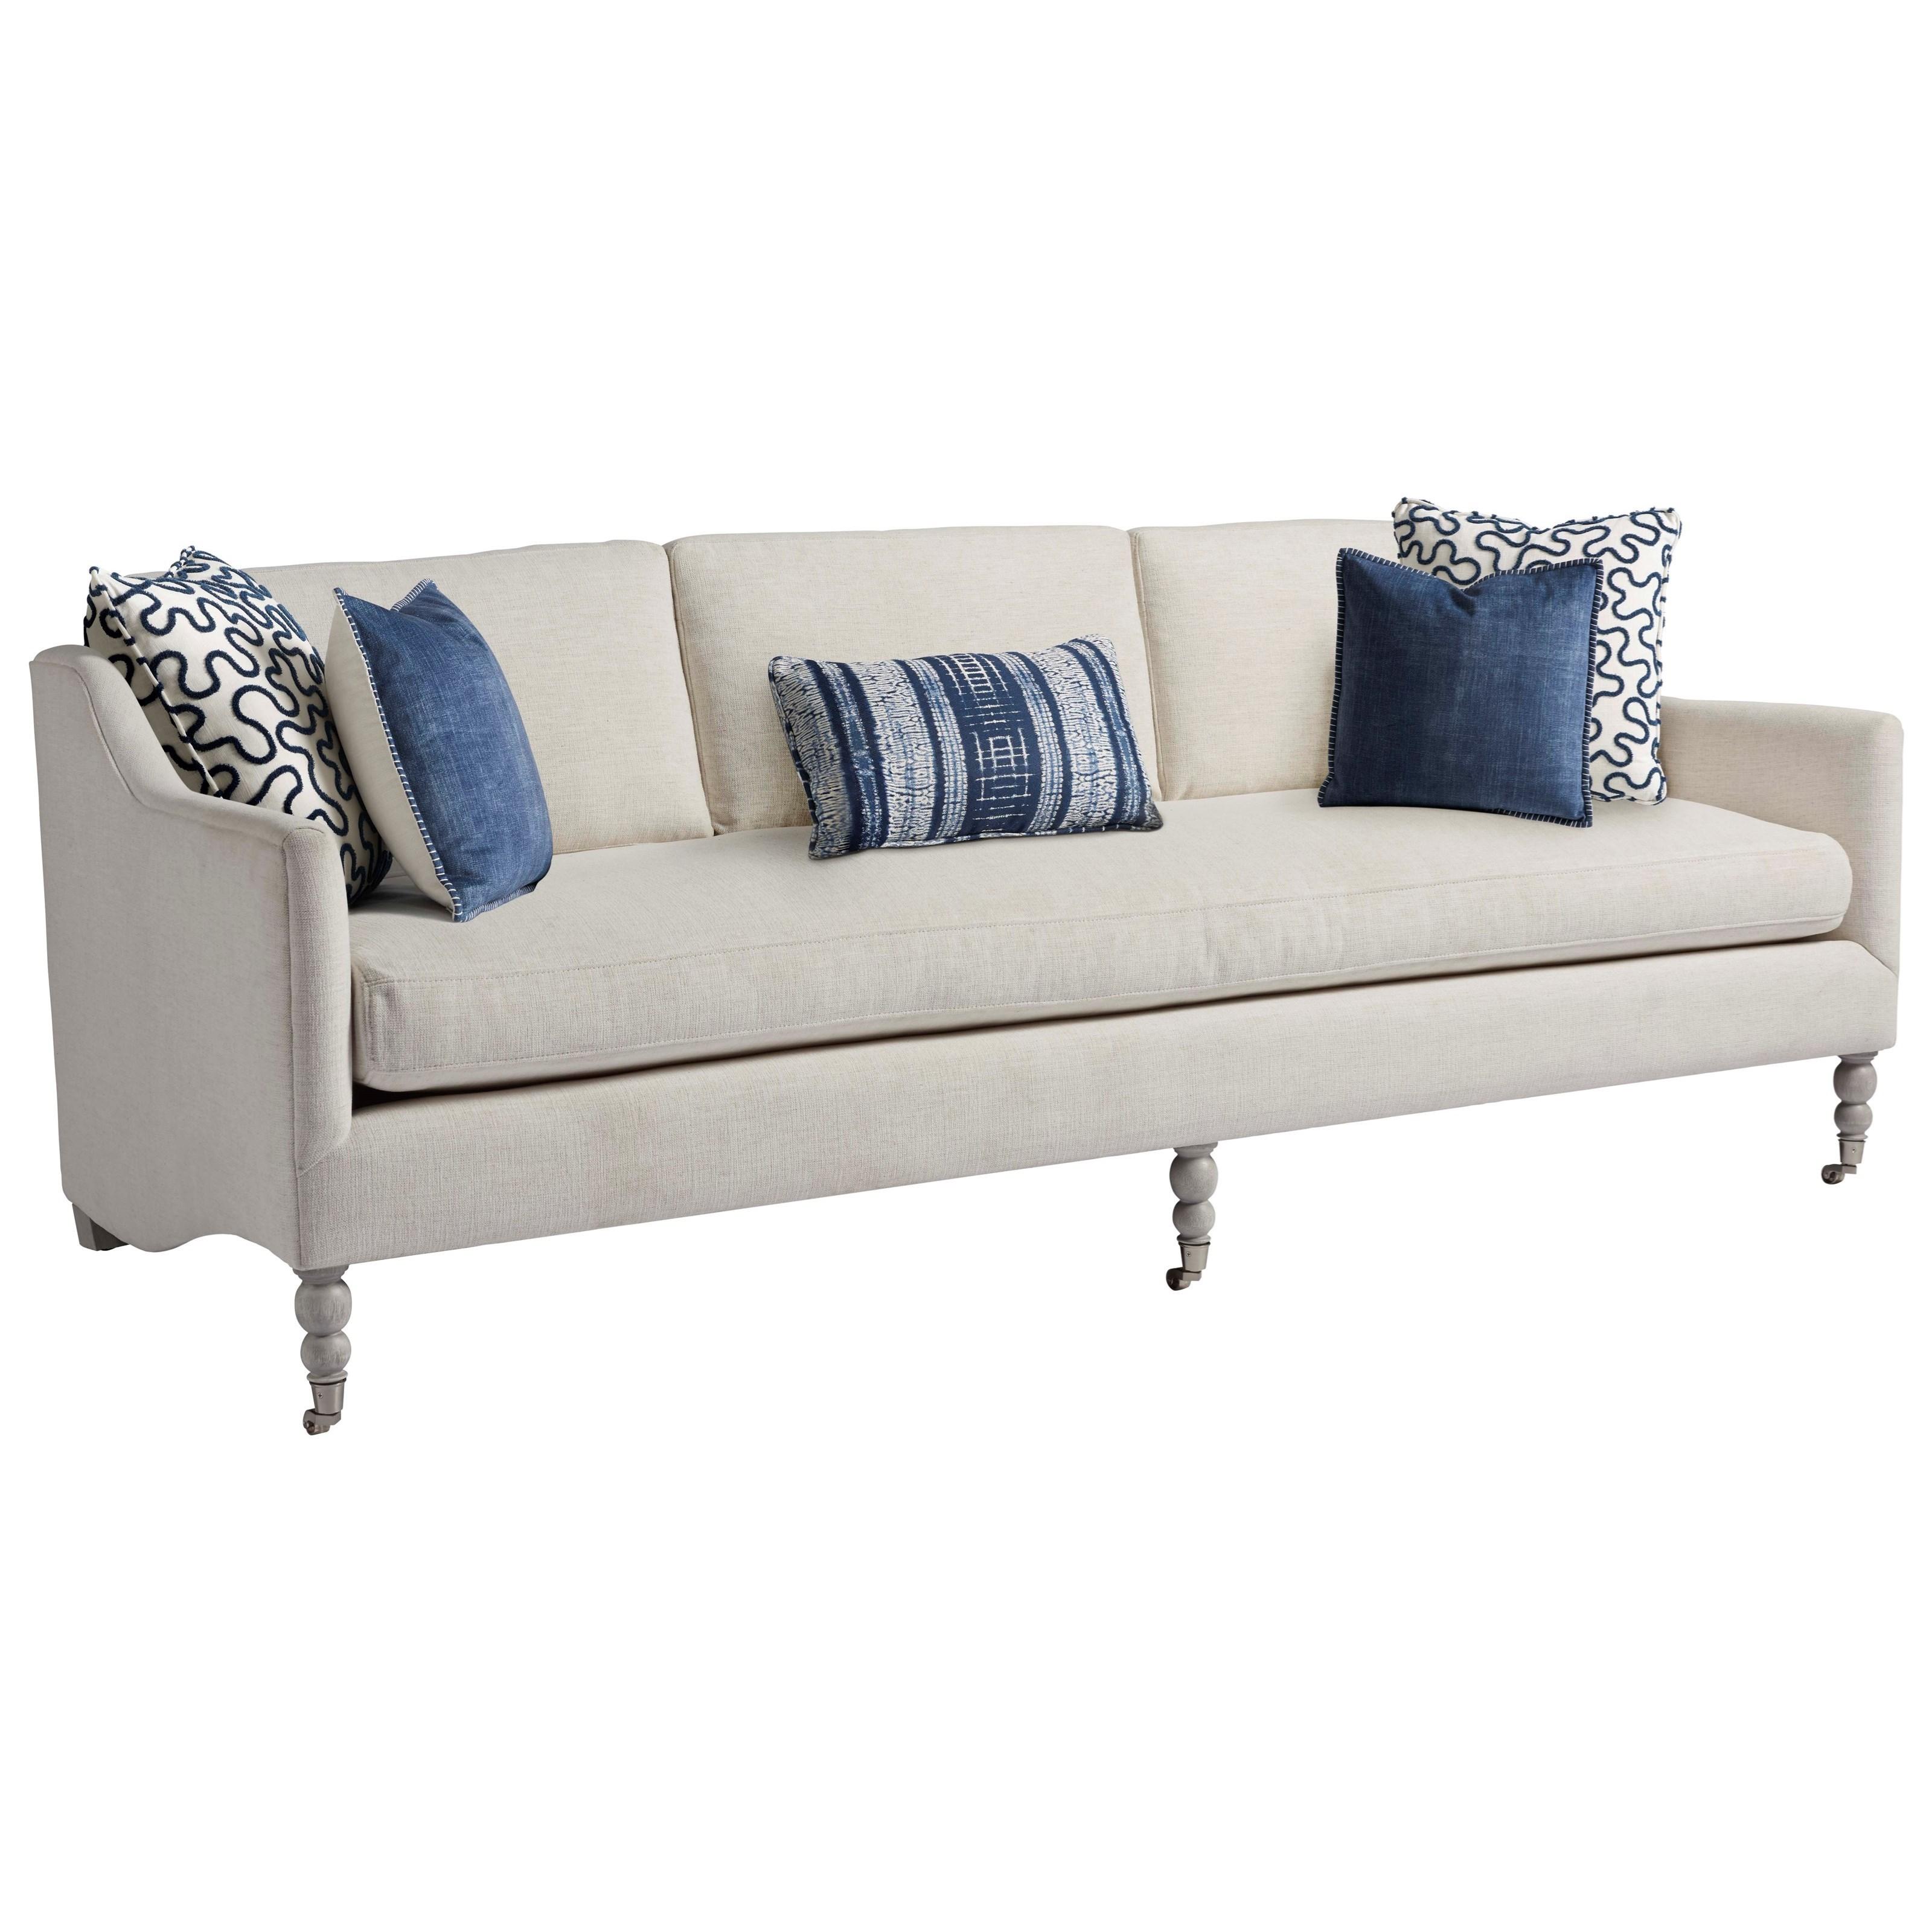 Coastal Living Home - Escape Sofa by Universal at HomeWorld Furniture